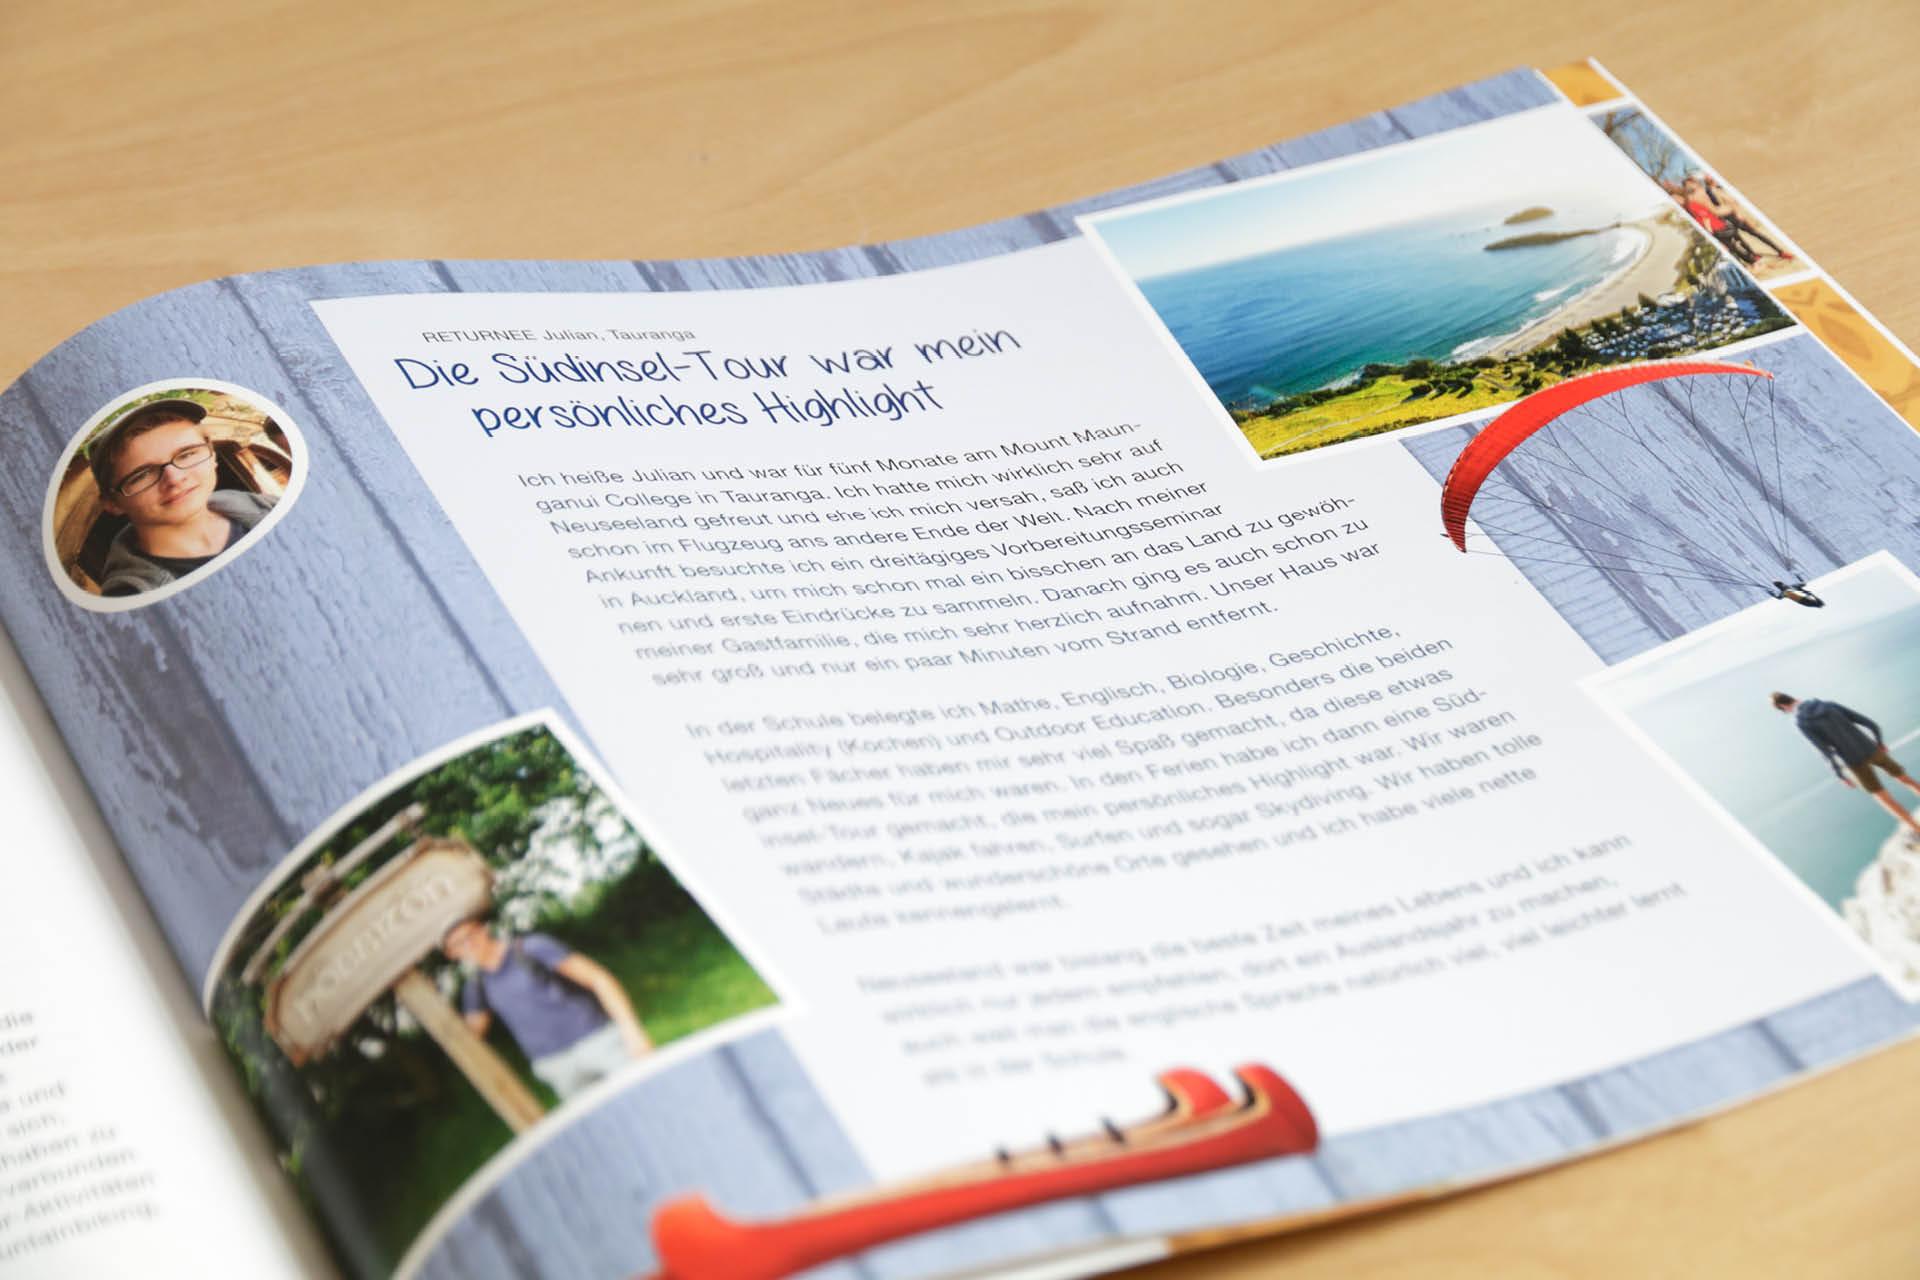 MAP Re-Design Katalog Erfahrungsbericht Returnee